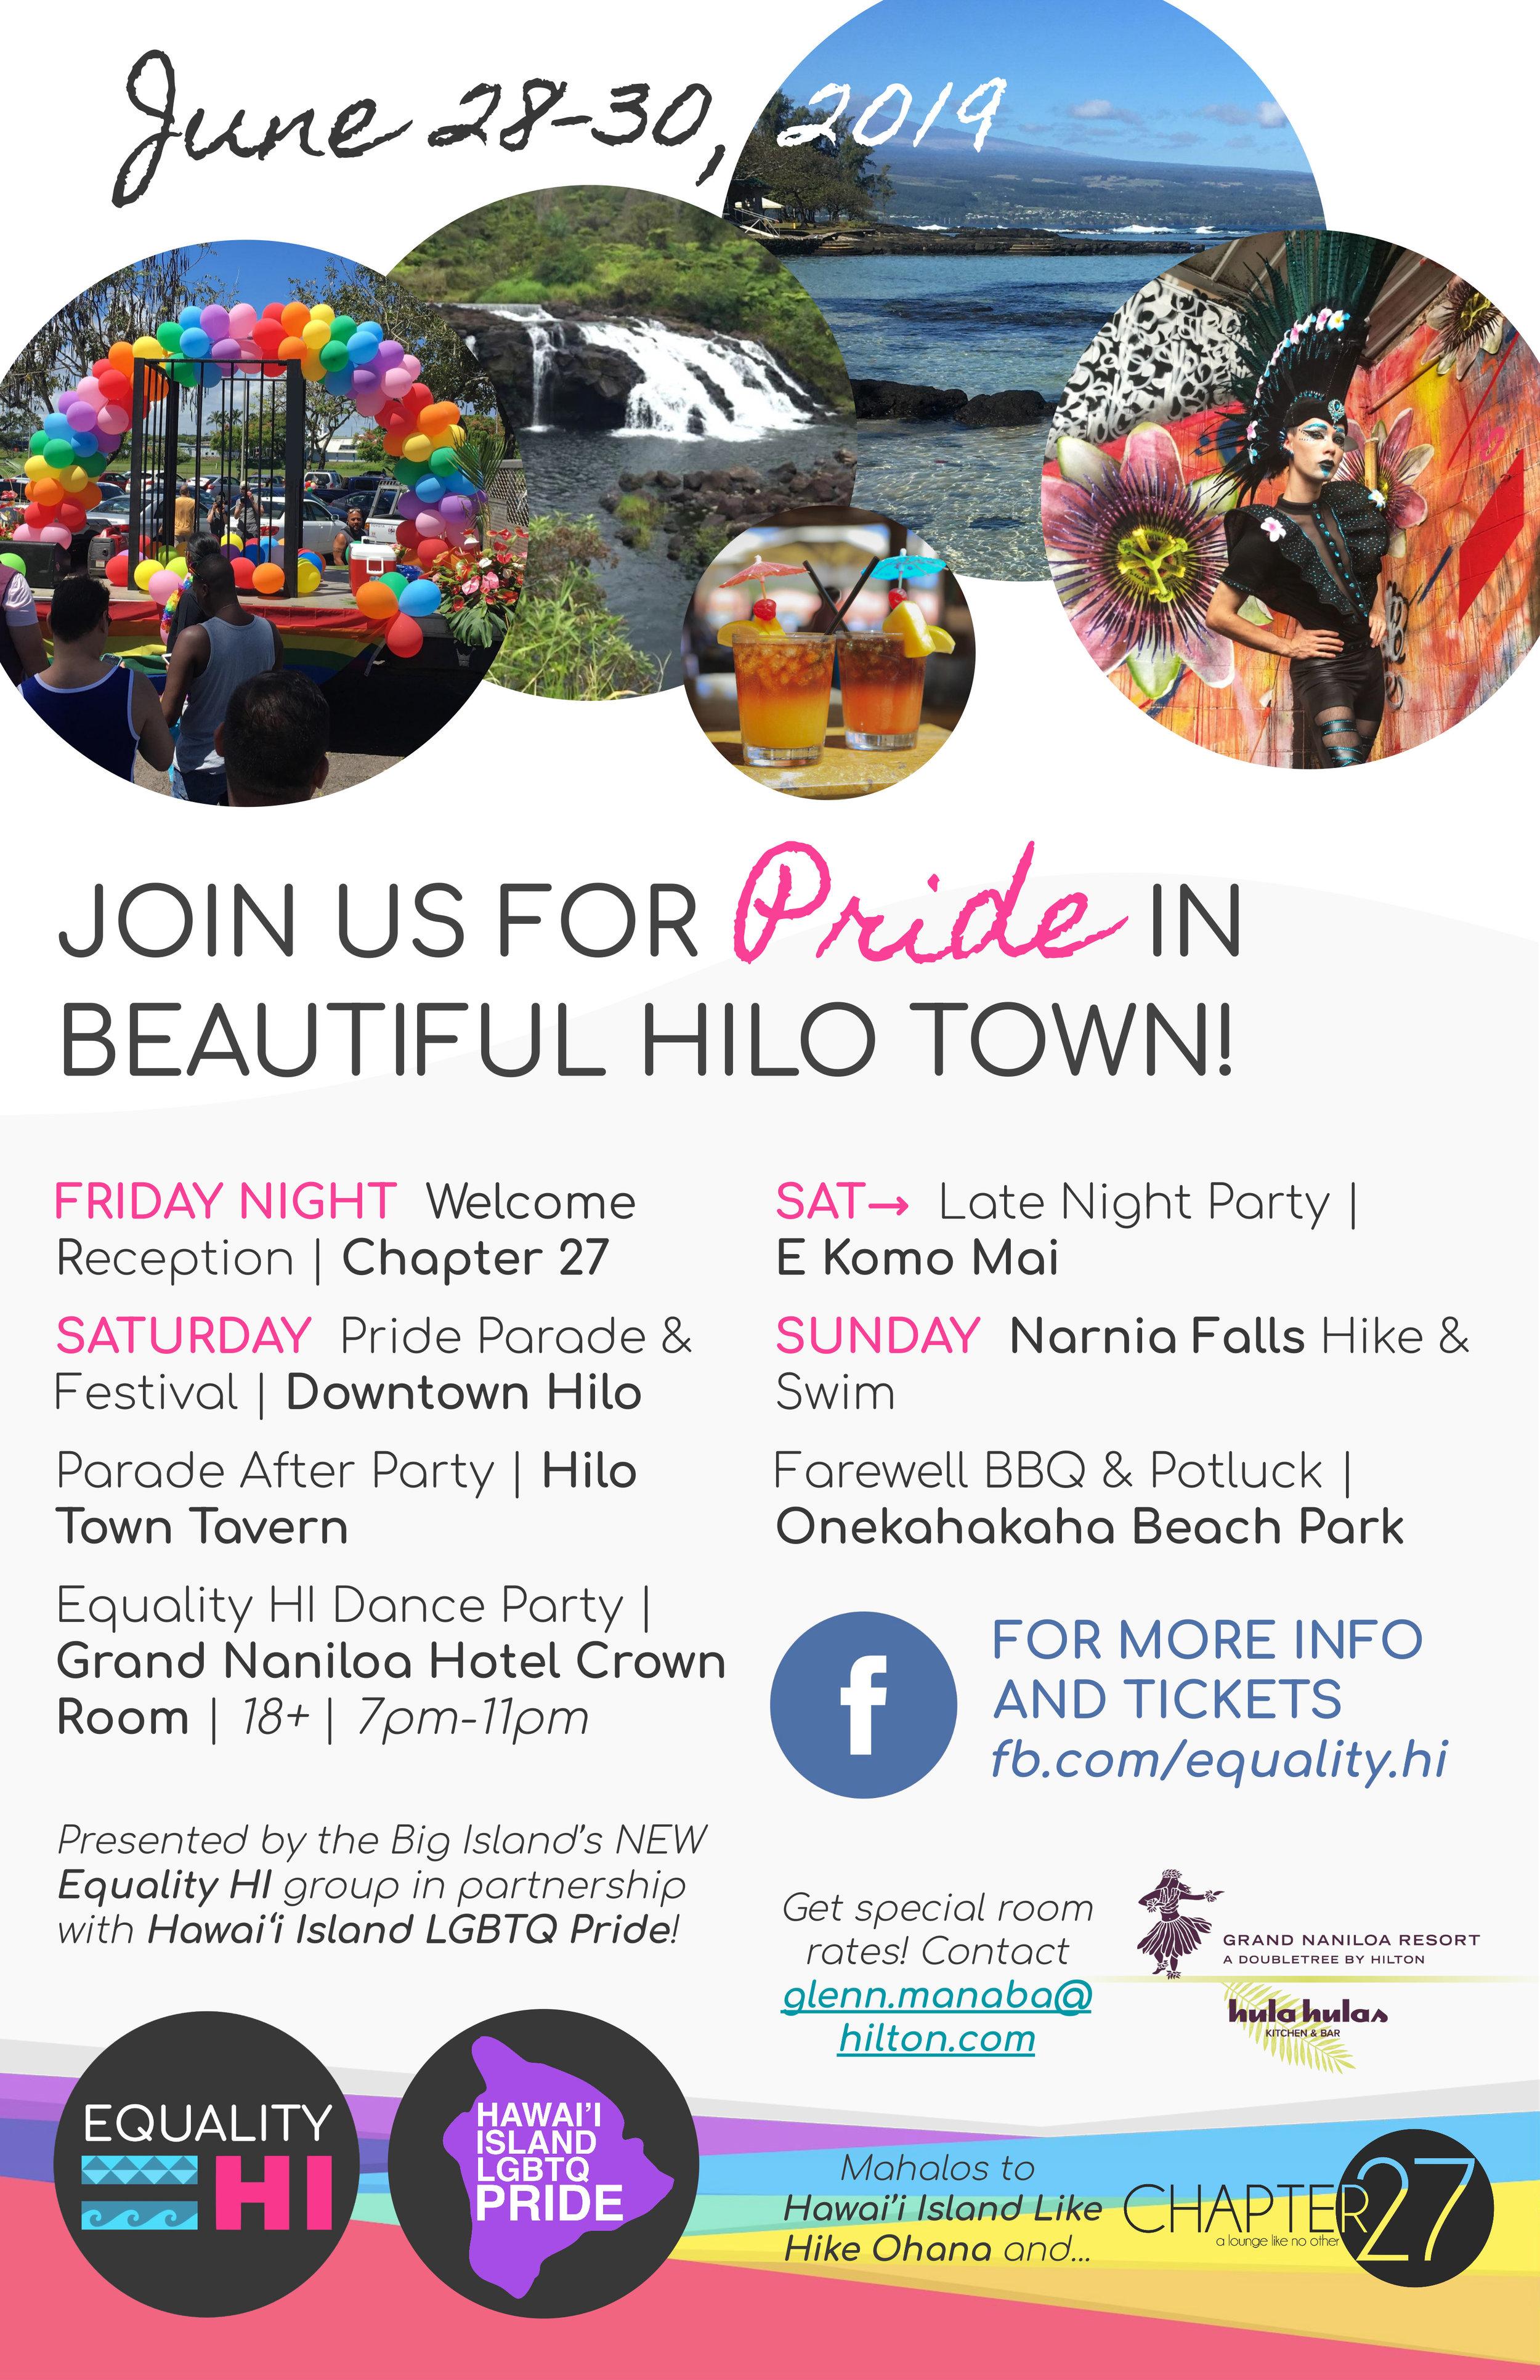 Equality HI 2019 Pride Poster.JPEG